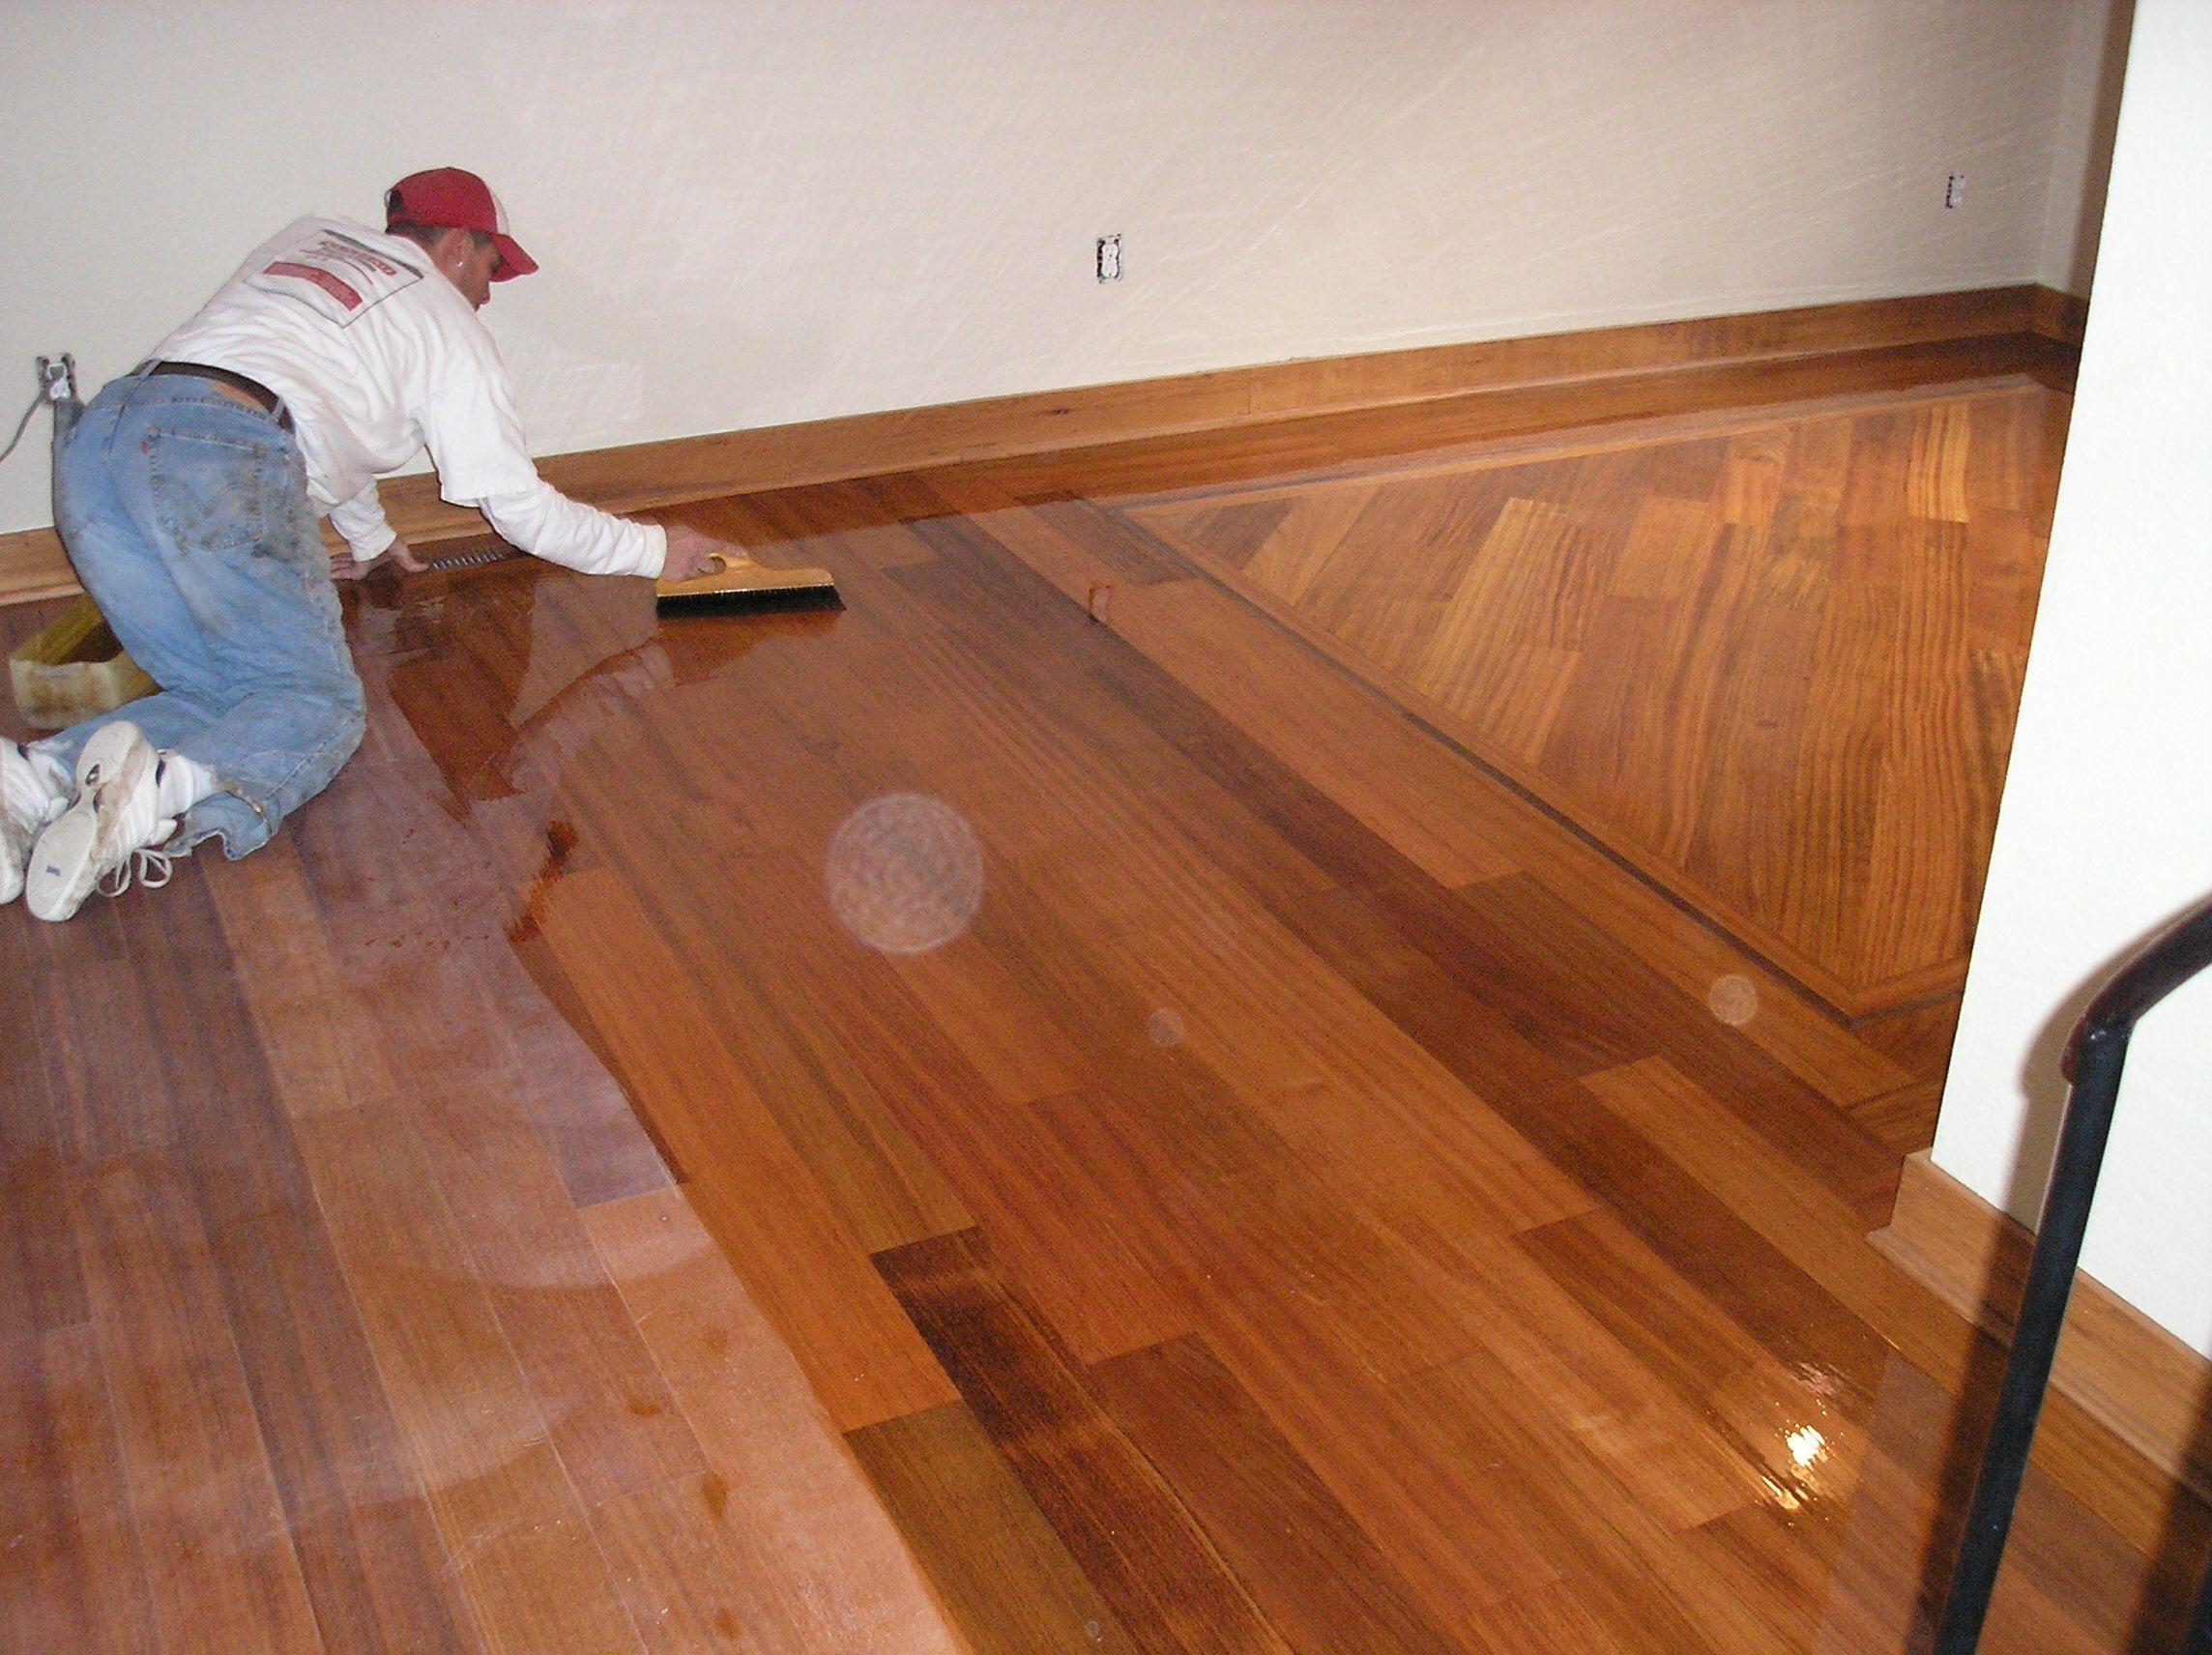 south florida hardwood flooring lowest prices around guaranteed hardwood flooring pinterest light hardwood floors flooring ideas